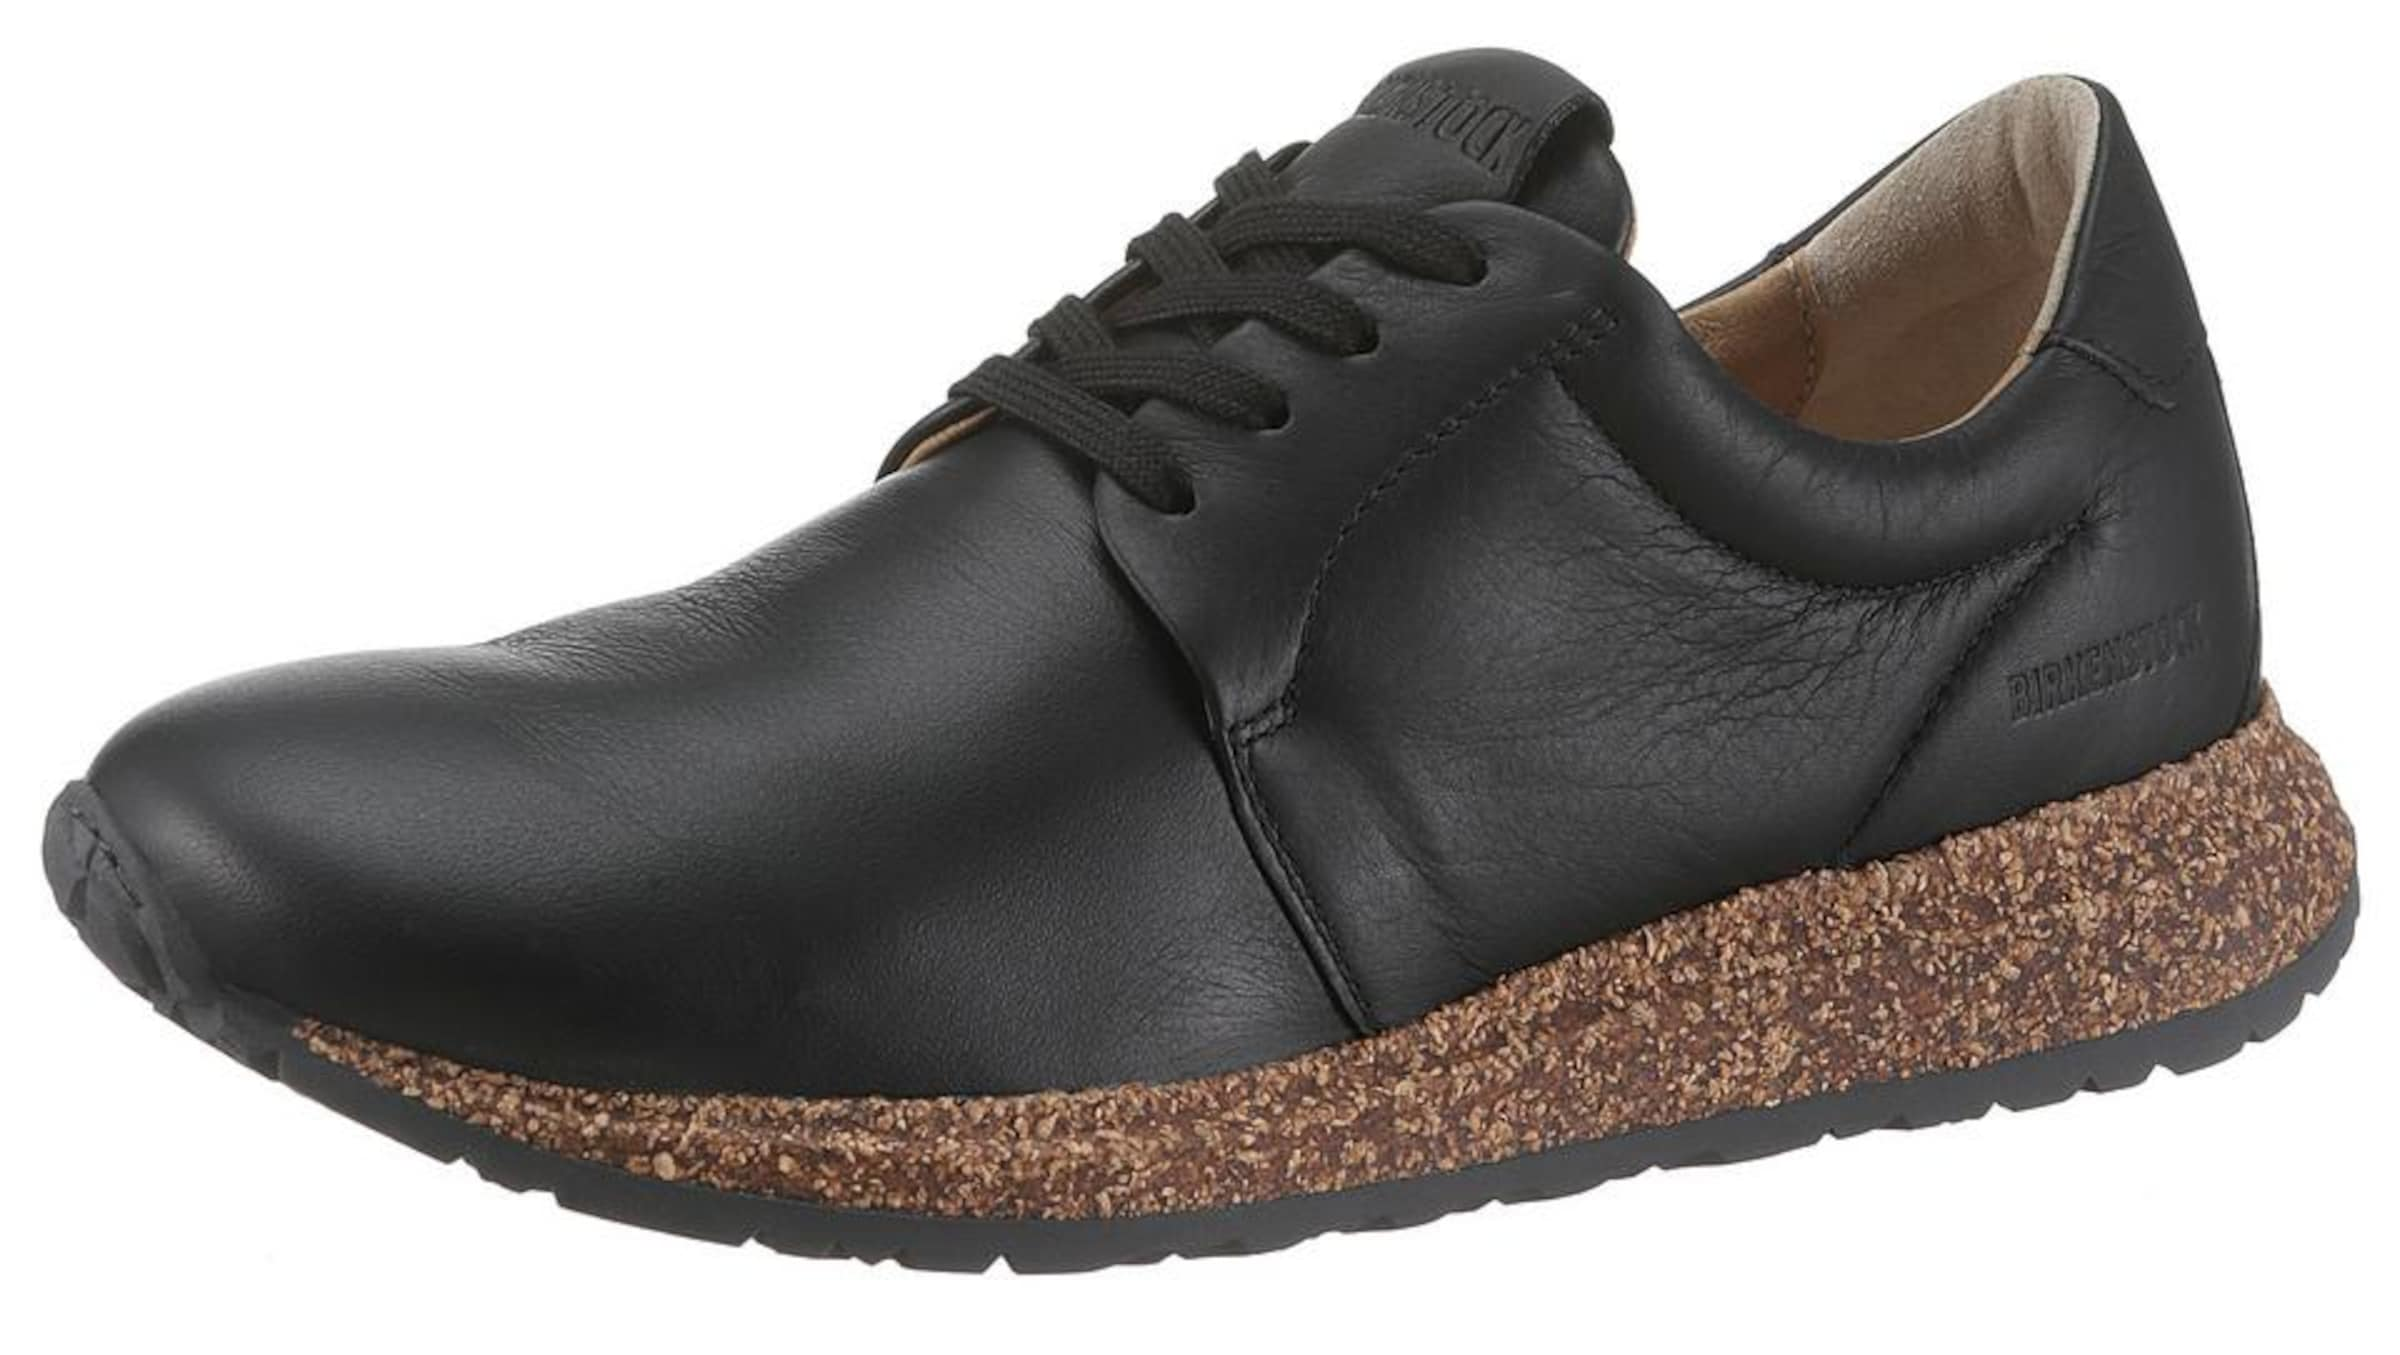 Schwarz Birkenstock Women' 'wrigley Sneaker In CoBxed